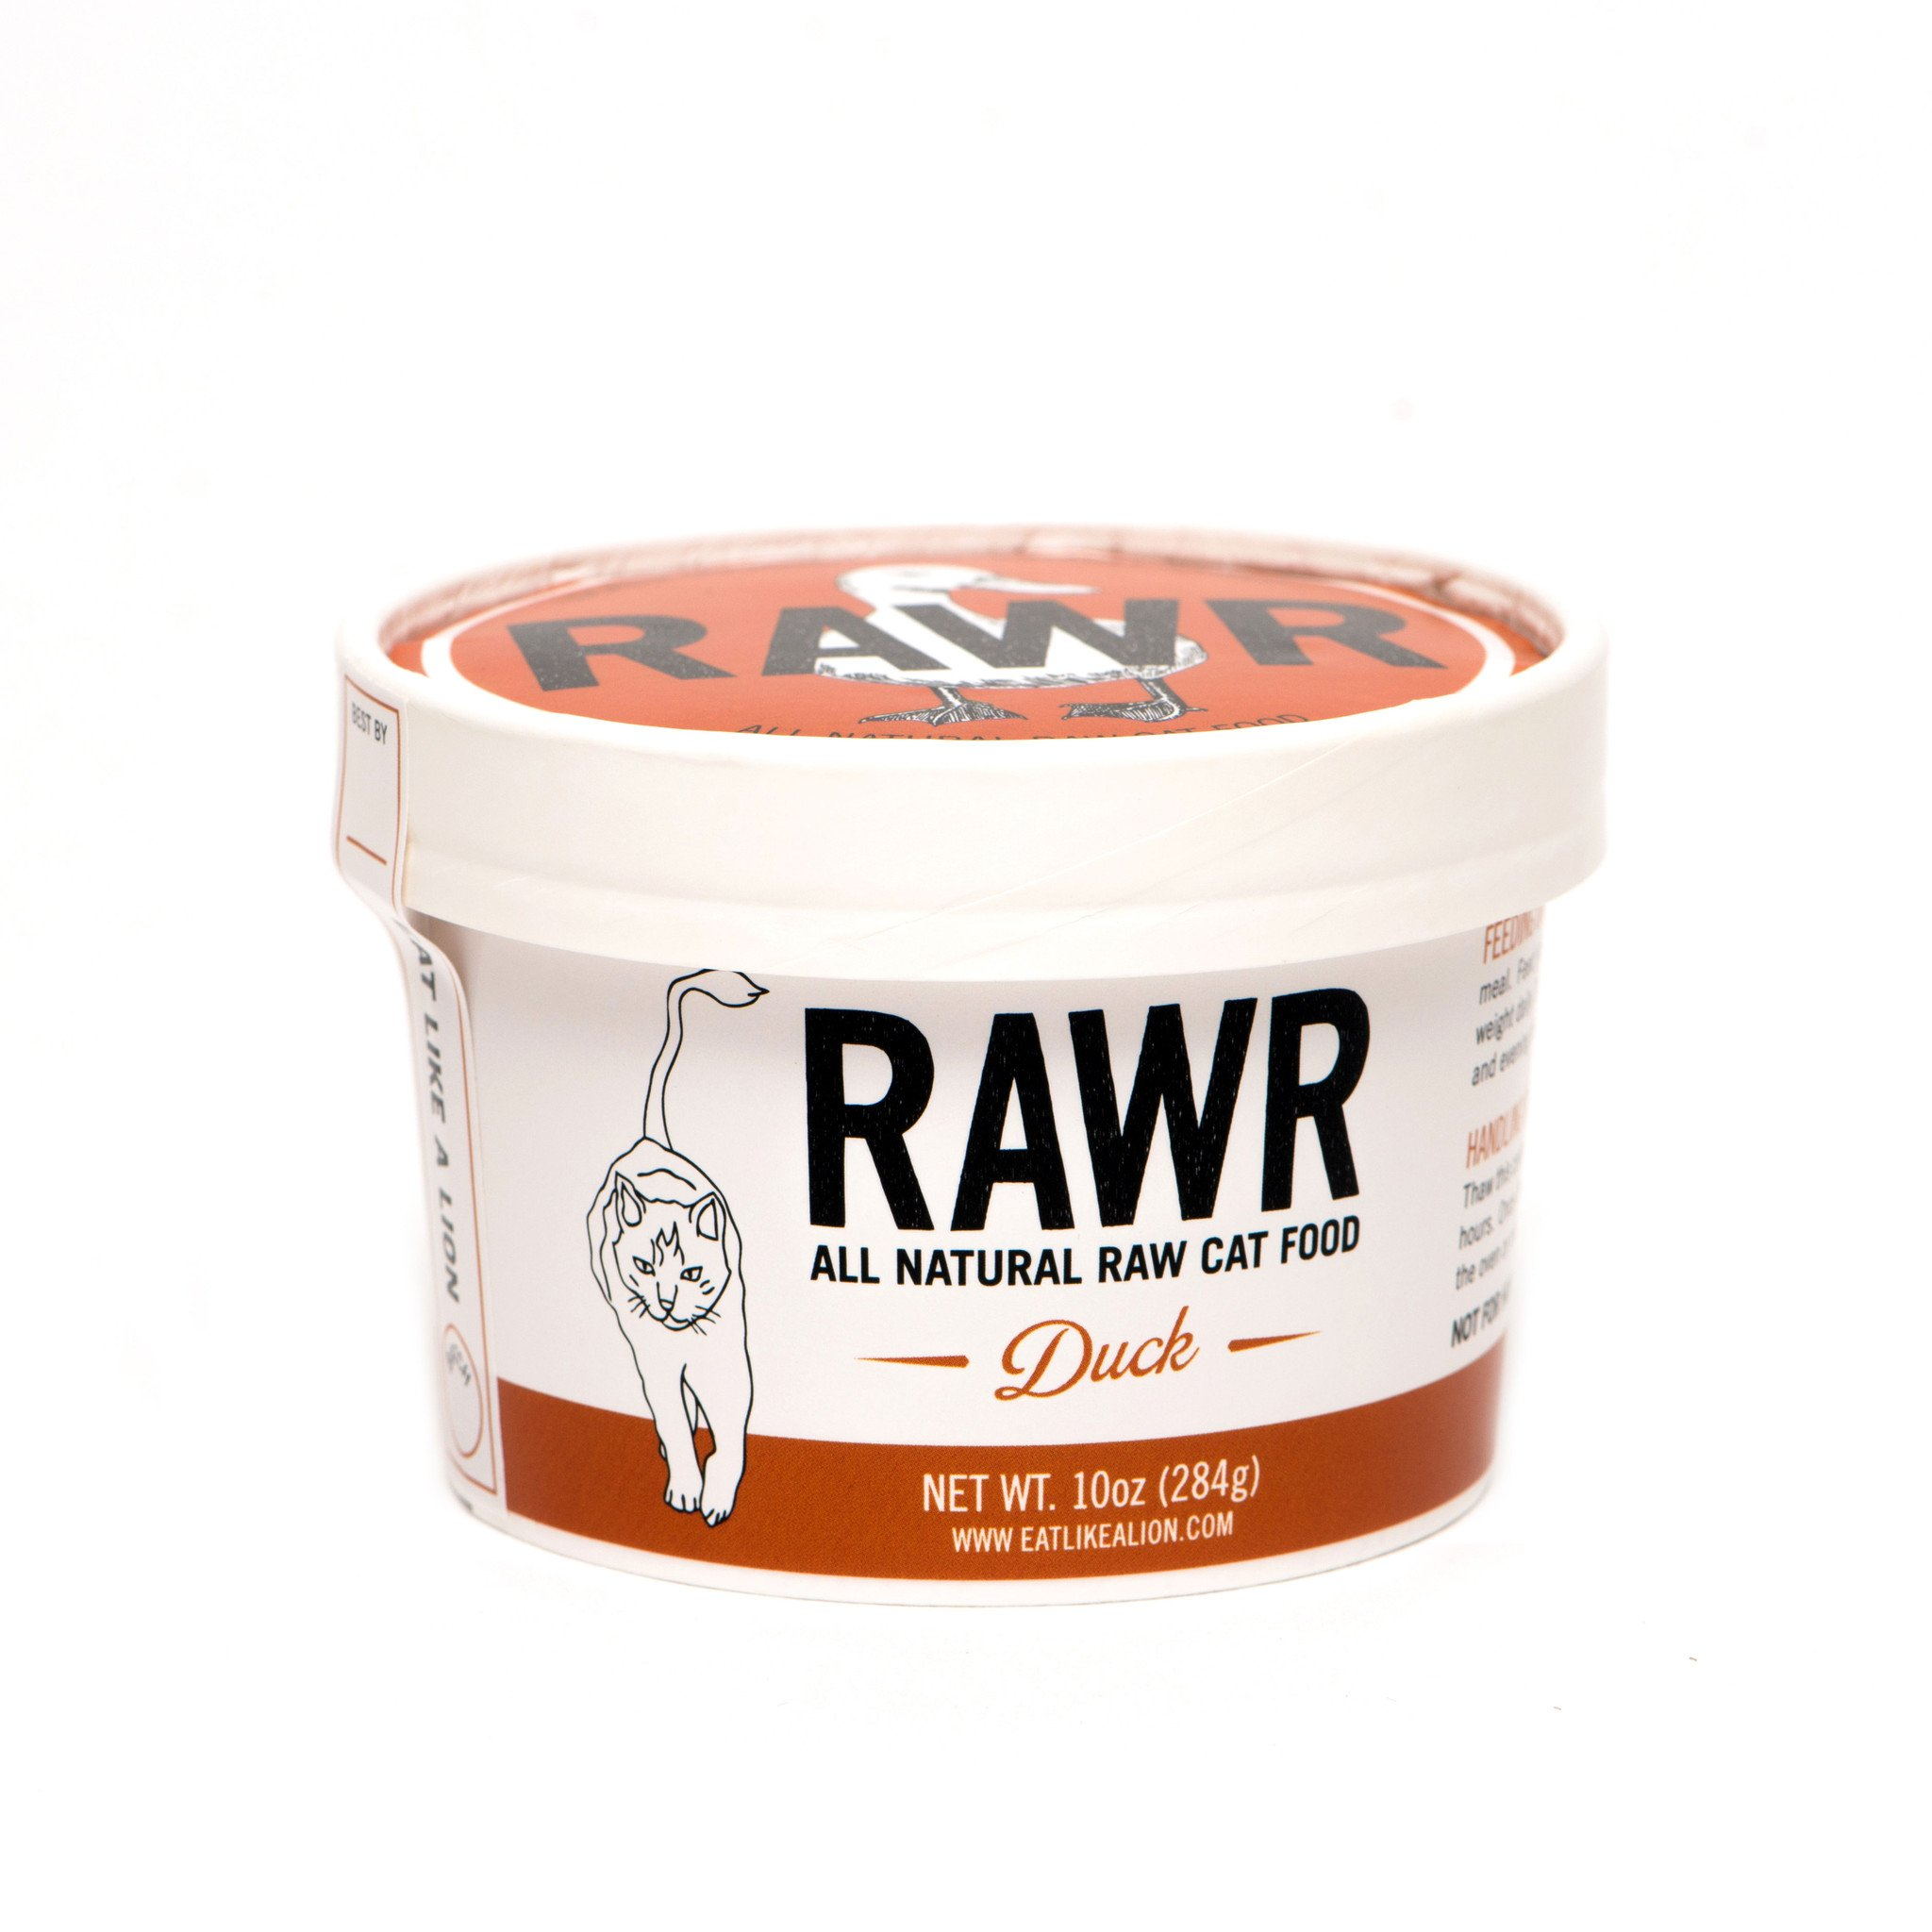 RAWR All Natural Duck Raw Frozen Cat Food, 16-oz